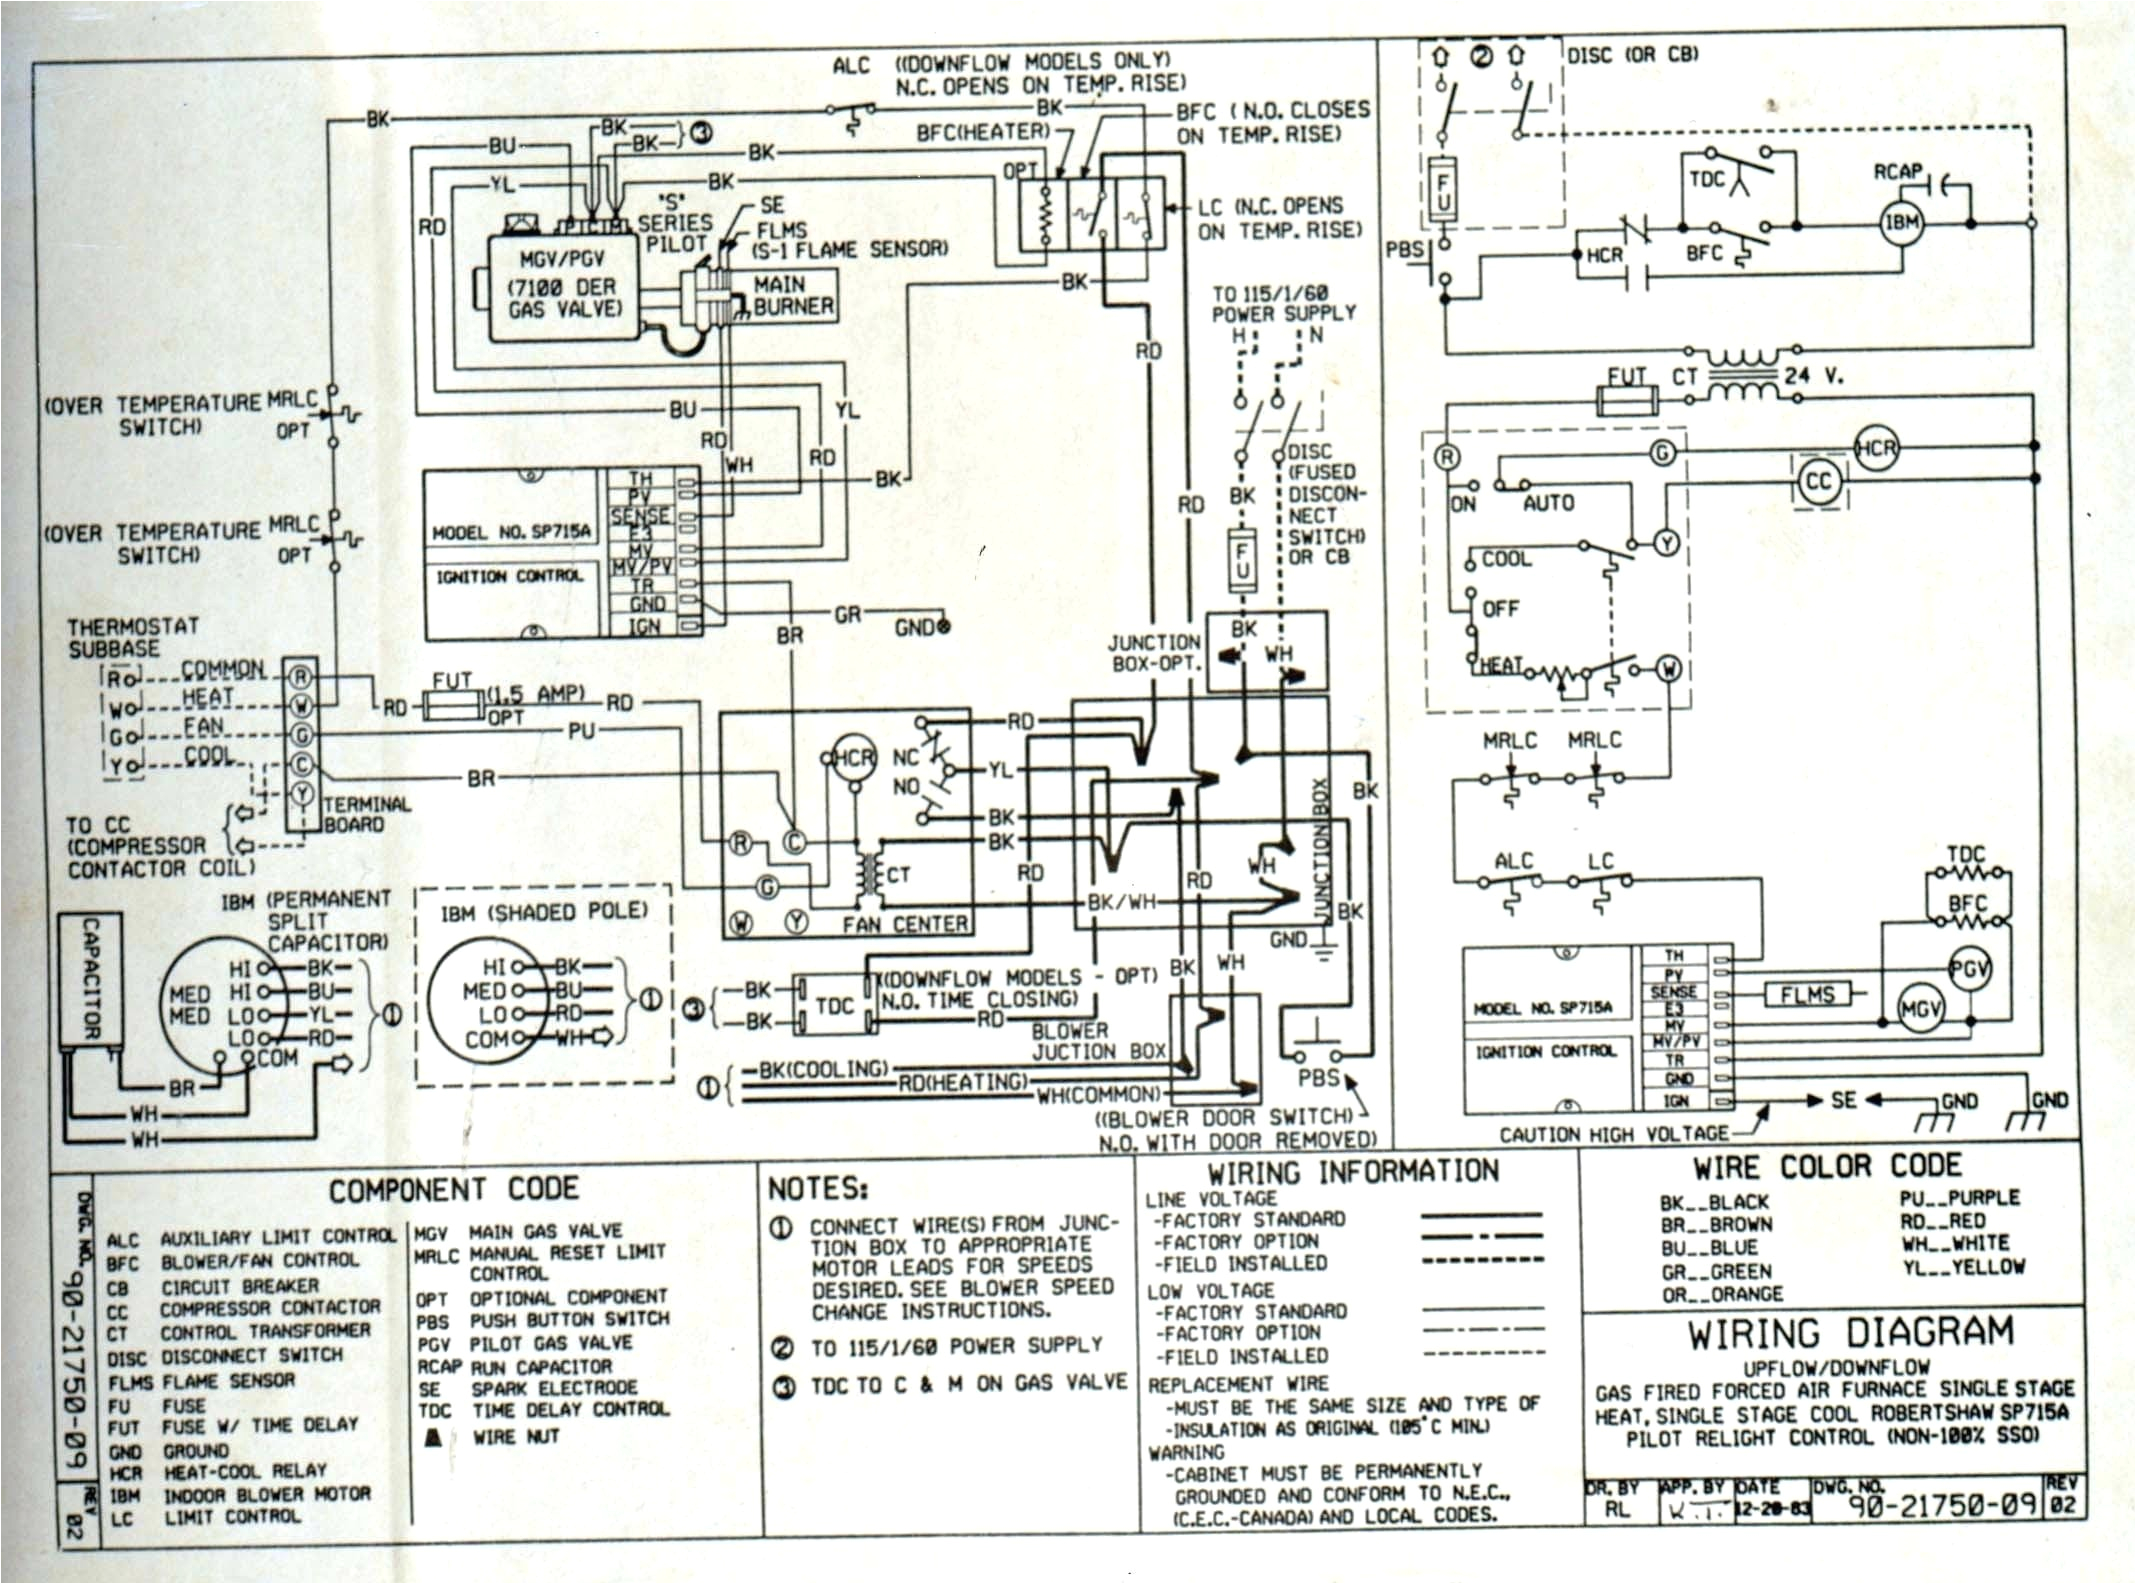 grandaire ac wiring diagram wiring diagrams value grandaire ac wiring diagram